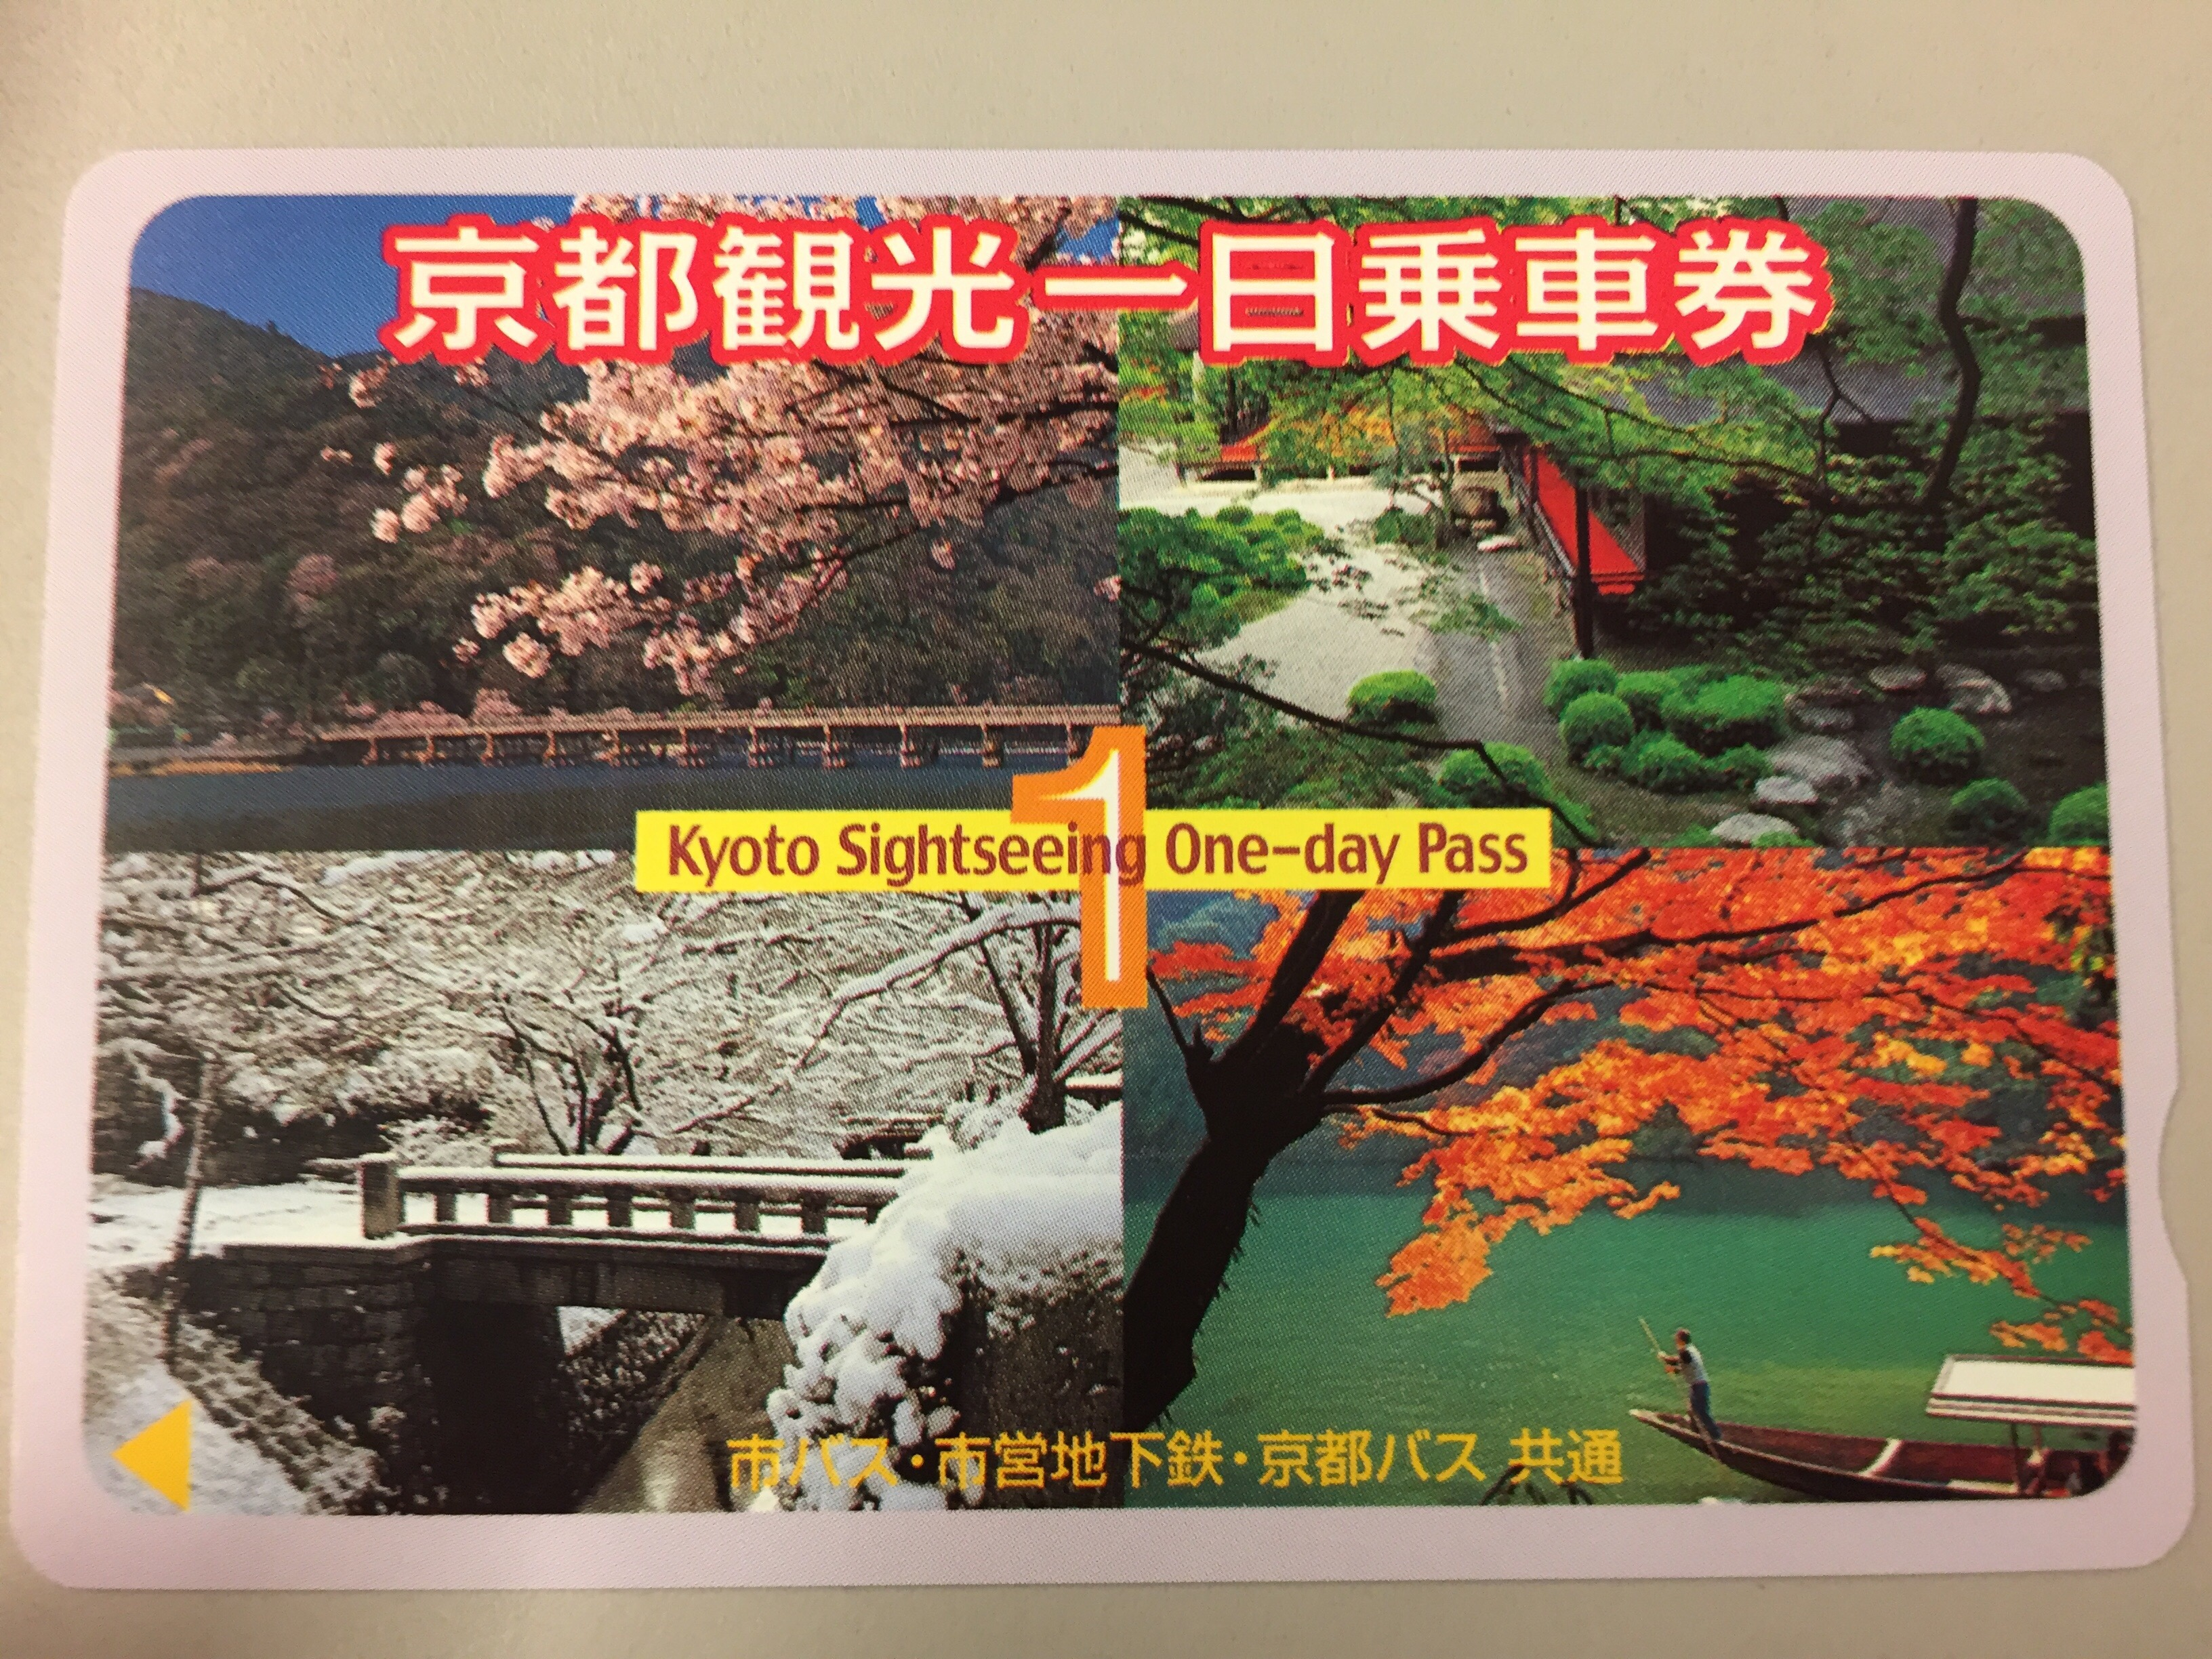 京都観光1日(2日)乗車券の券売機の場所【備忘録】